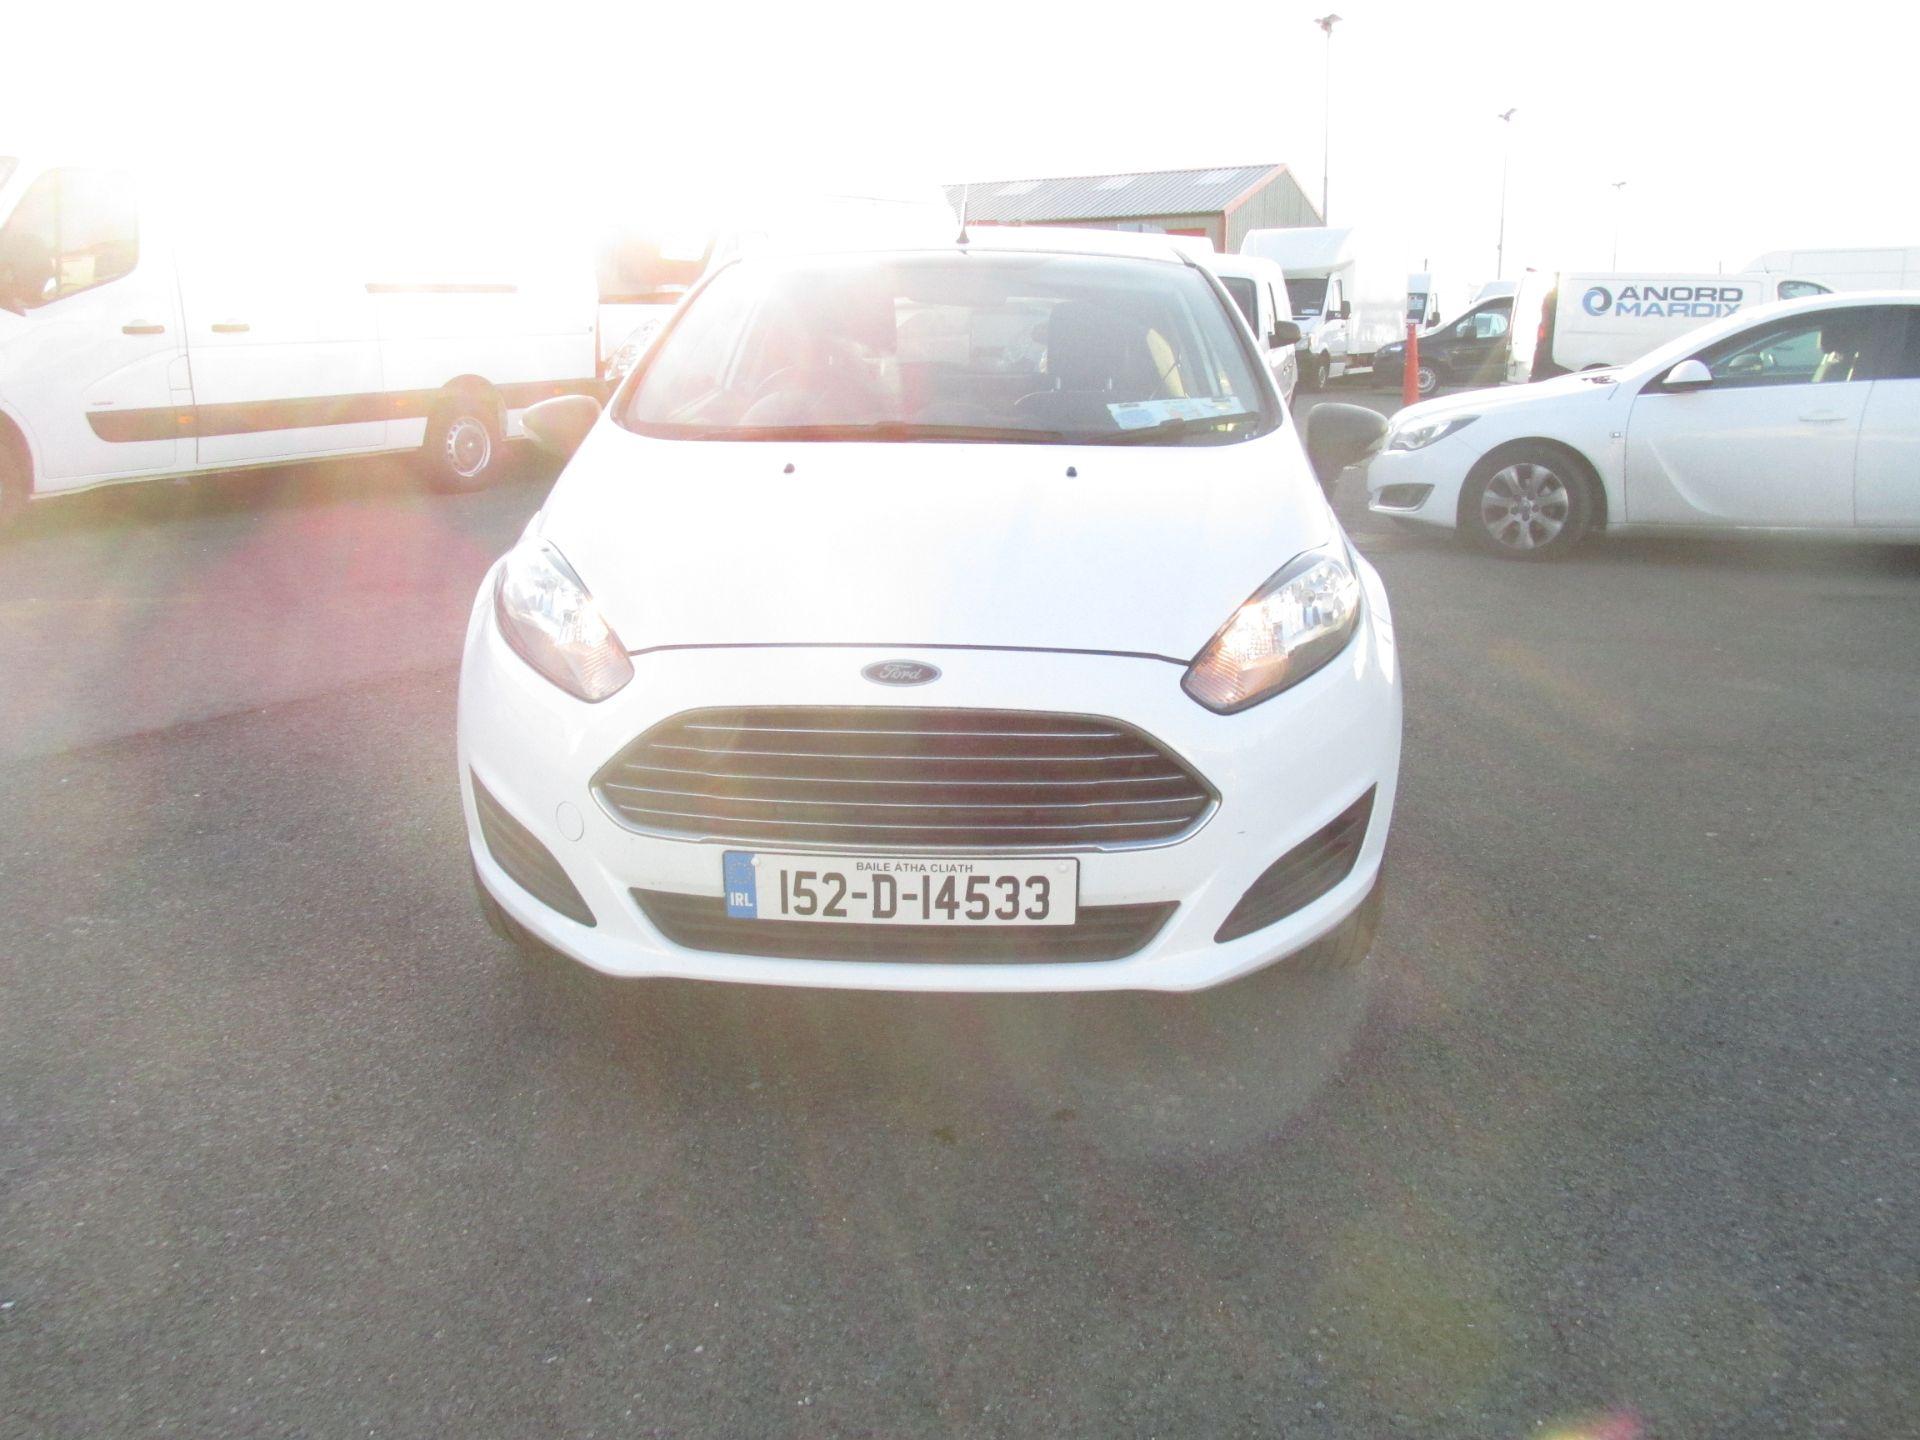 2015 Ford Fiesta BASE TDCI (152D14533) Image 8